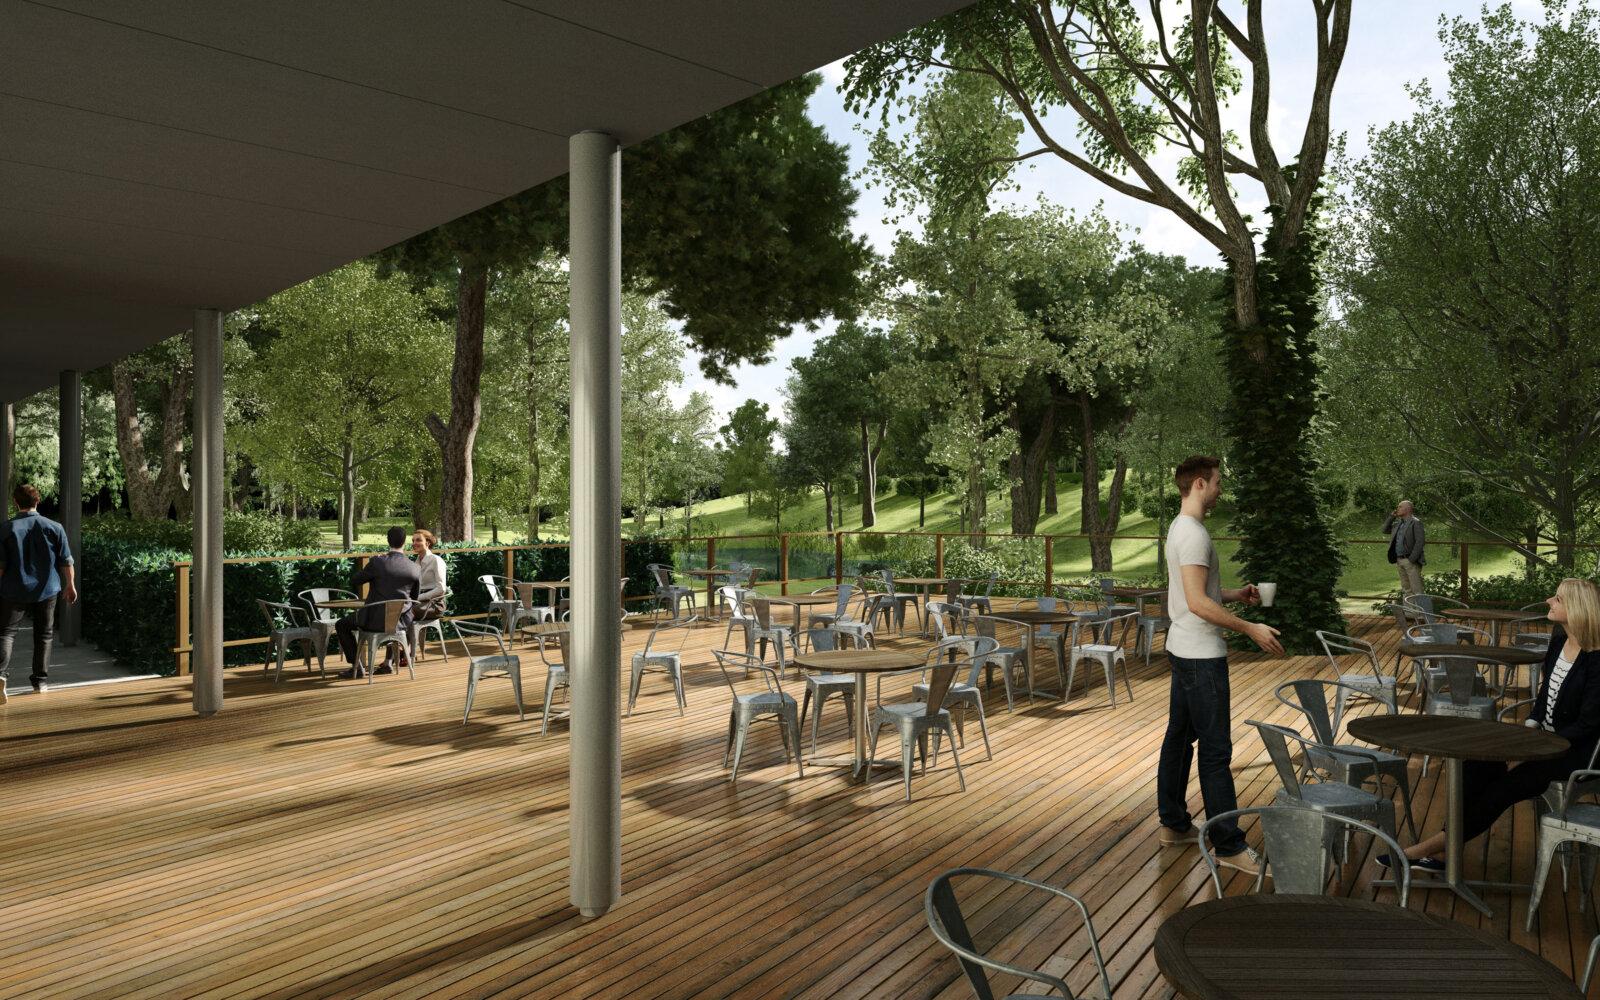 Stansfeld Park decked cafe area